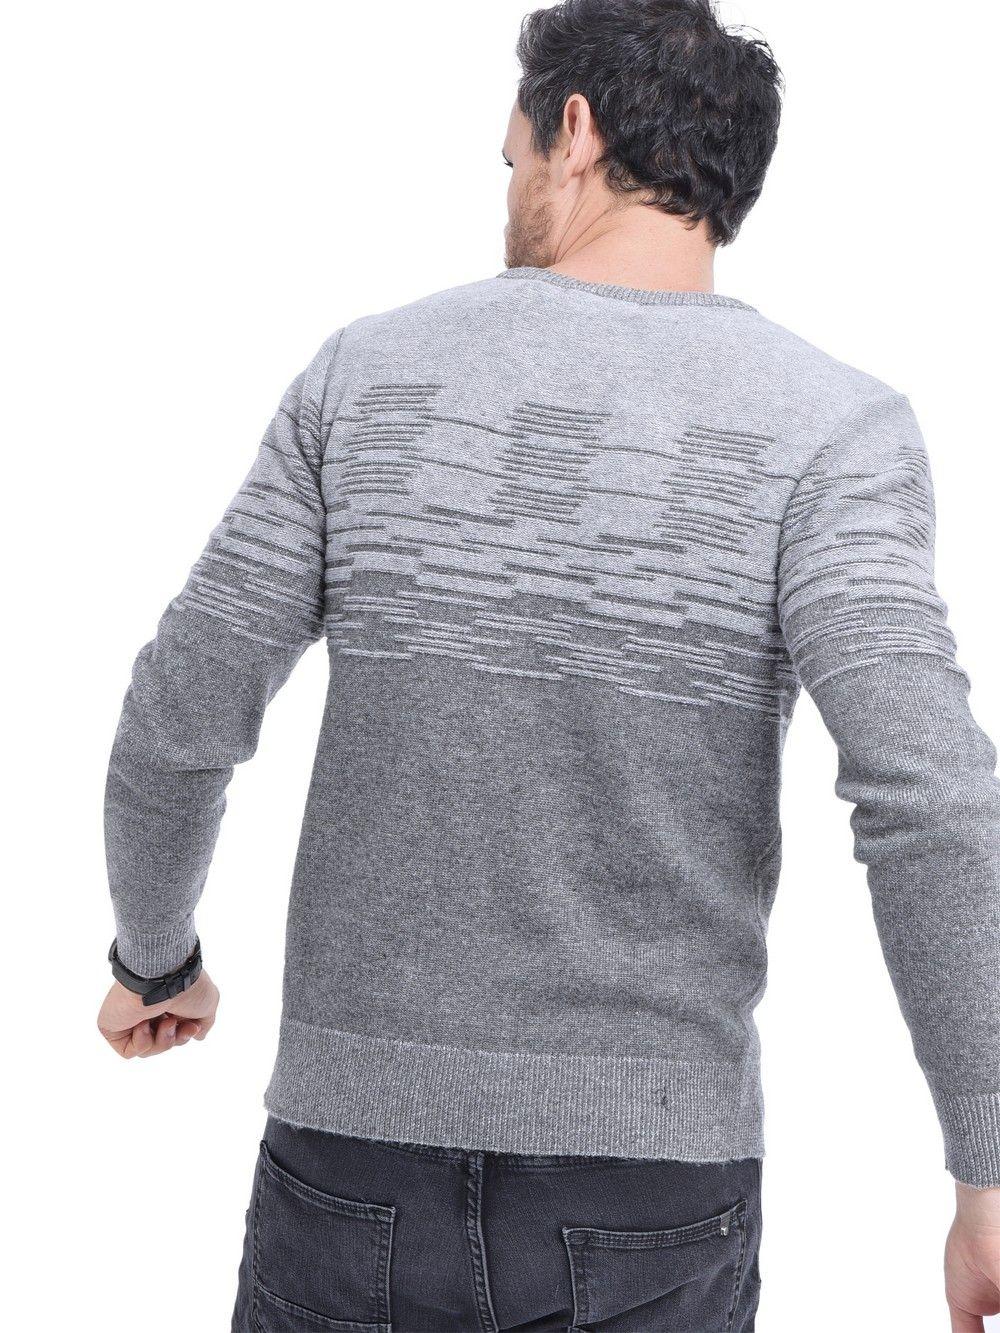 William De Faye Round Neck 3-ply Jacquard Sweater in Grey